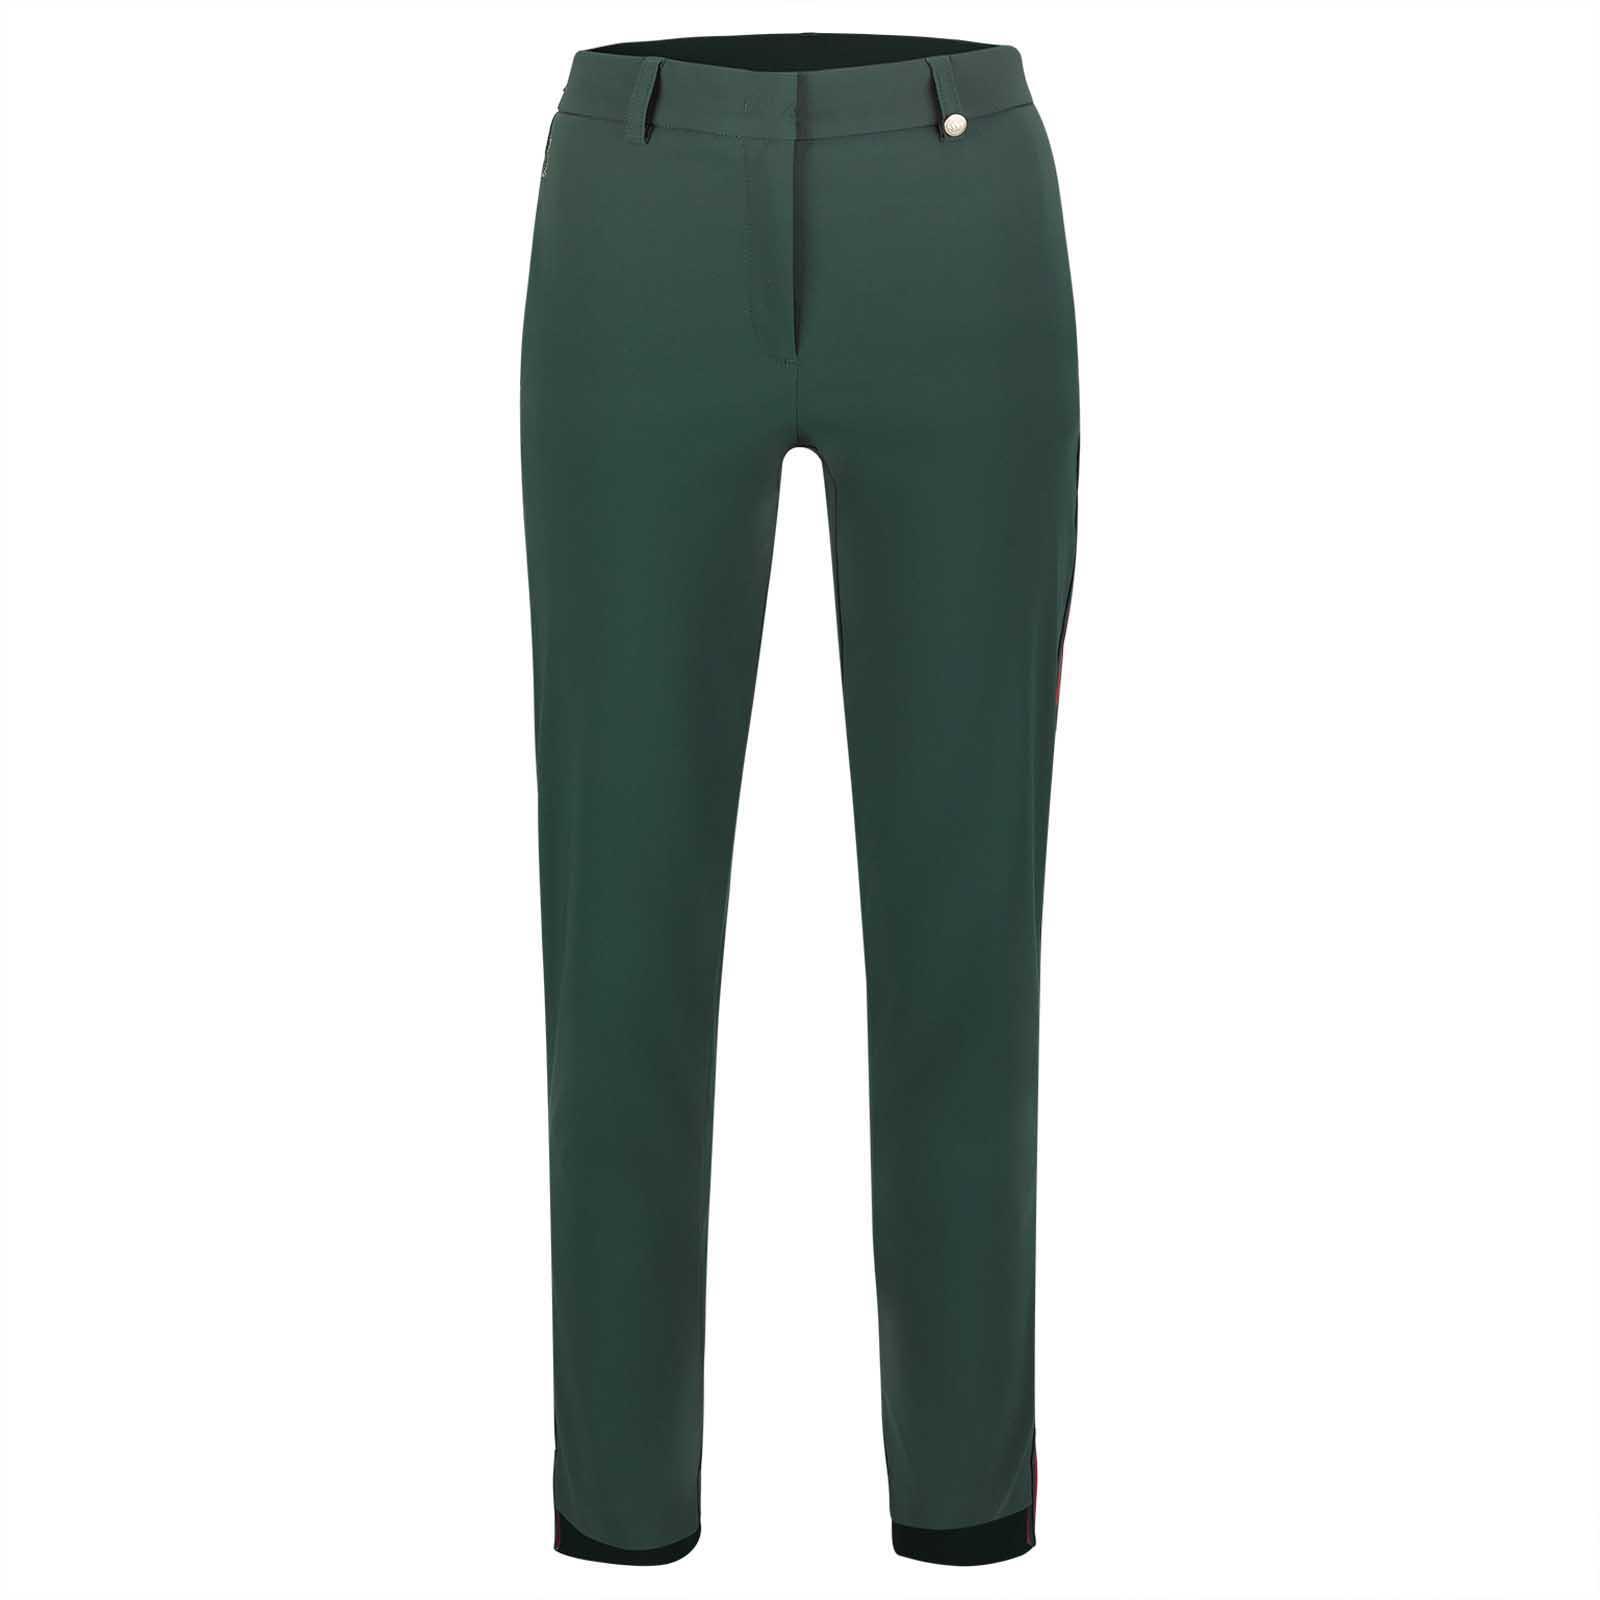 Pantalón elástico hidrófugo de golf 7/8 de mujer Techno Stretch con protección solar